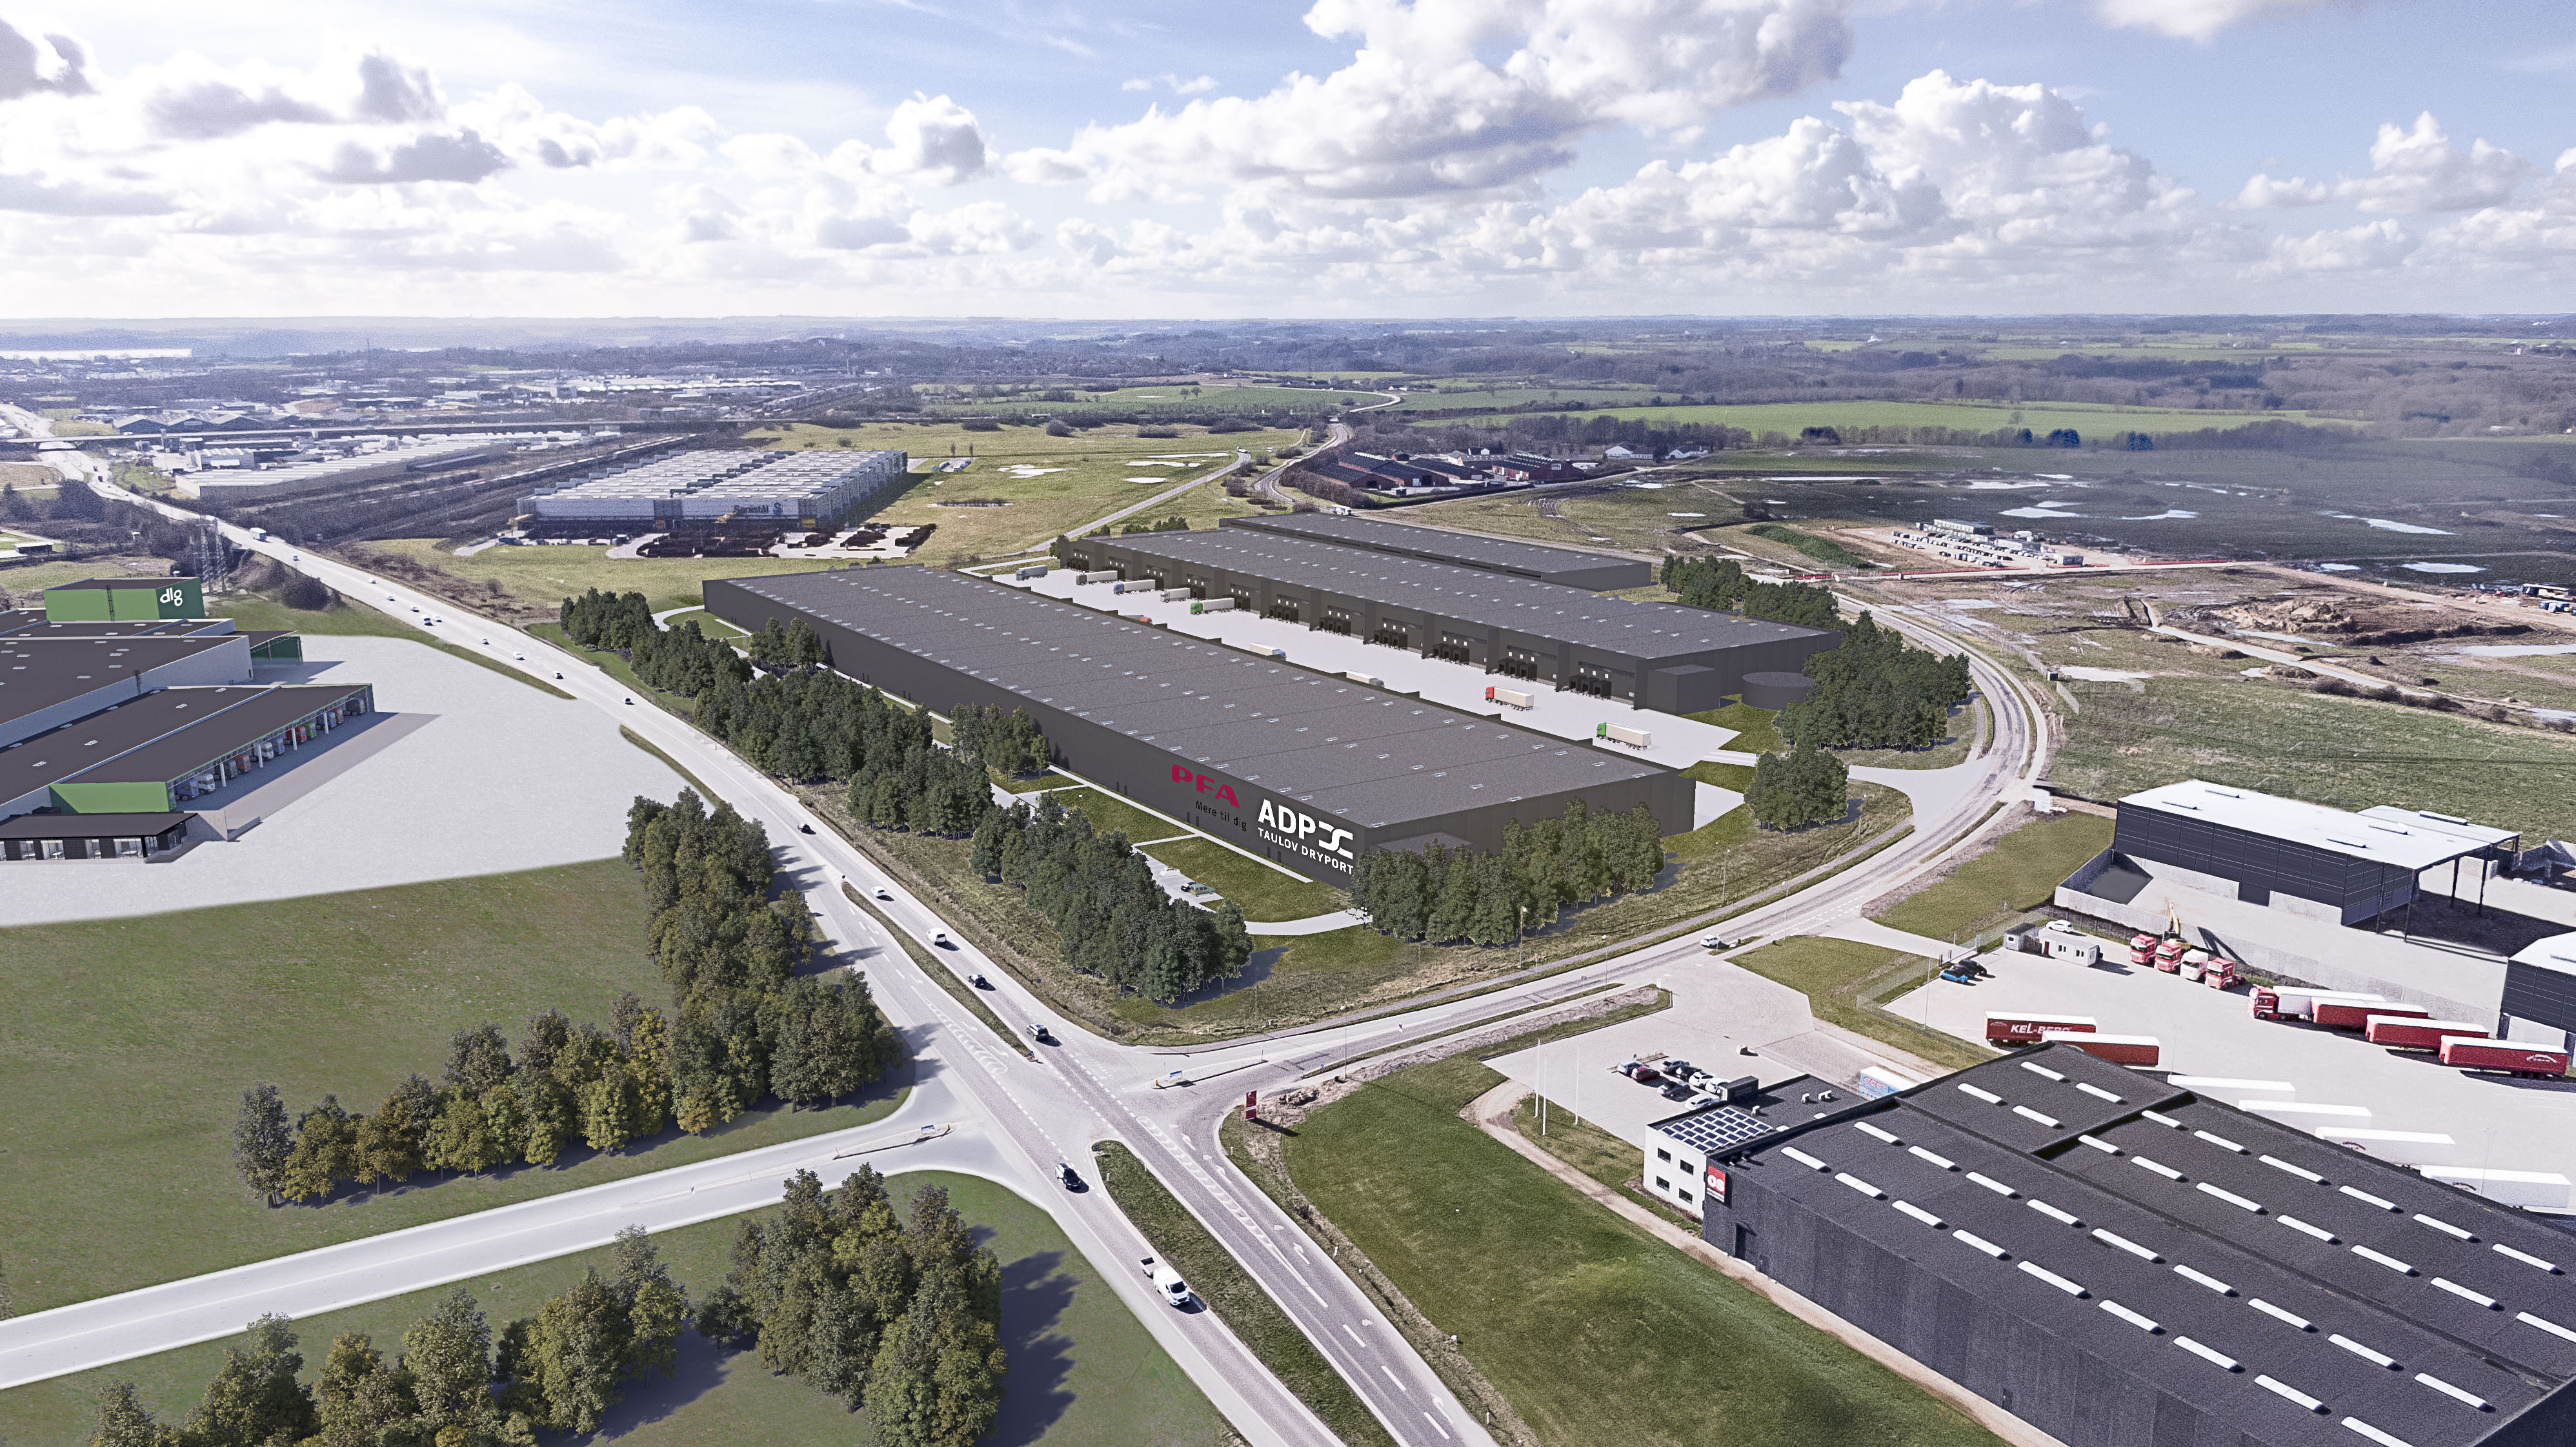 Maersk Og Adp Vil Bygge For En Milliard Kroner I Taulov Leder Idag